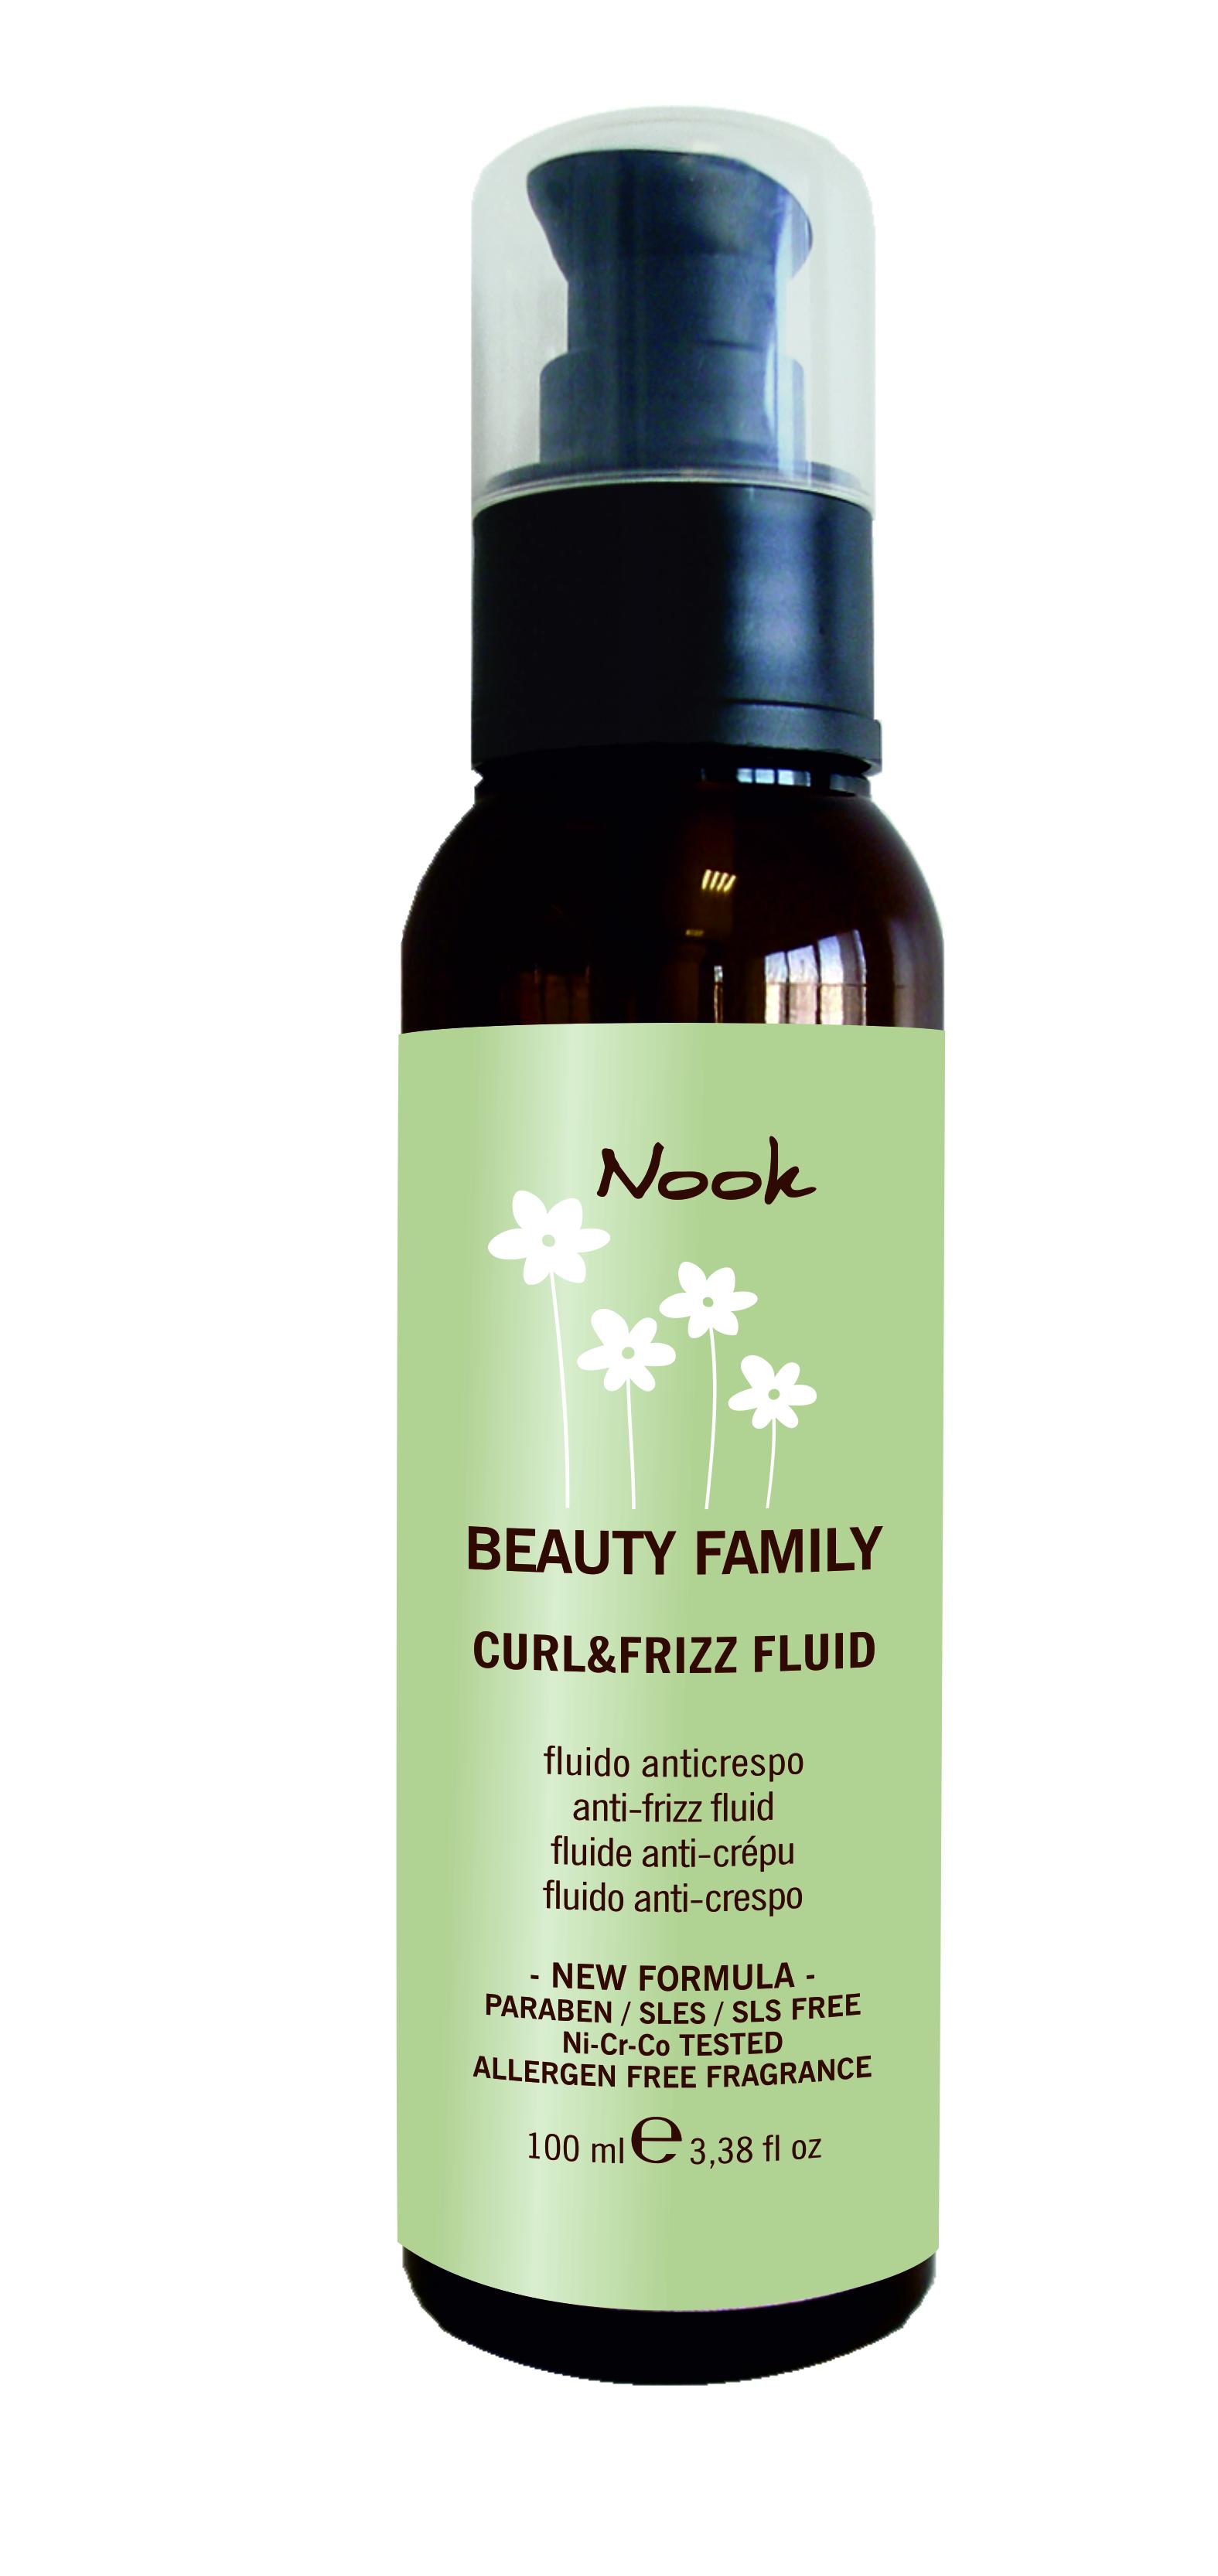 NOOK Флюид для кудрявых волос Ph 5,5 / Curl & Friz Fluid BEAUTY FAMILY 50мл от Галерея Косметики